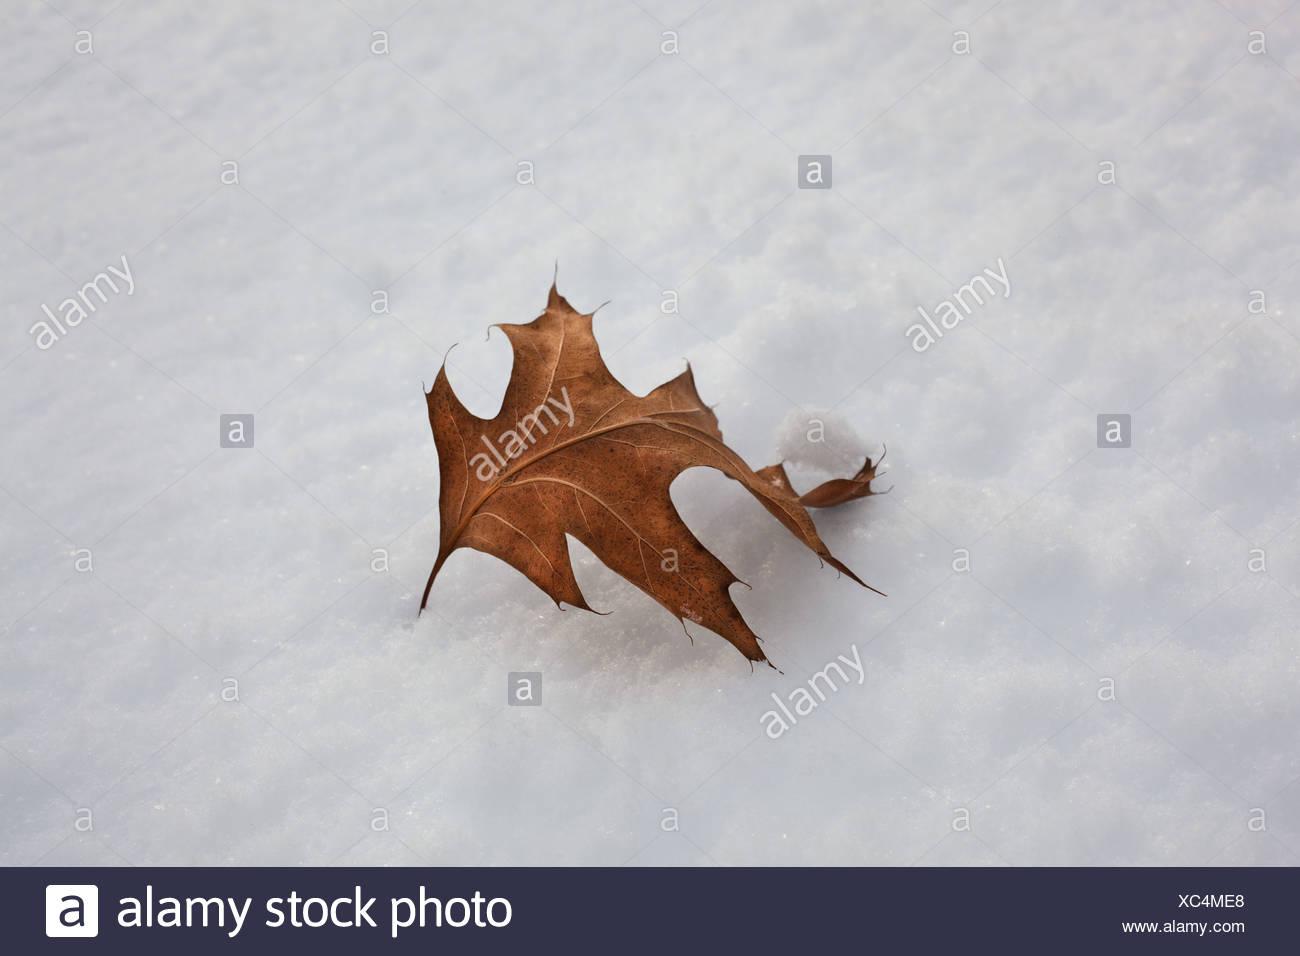 Une feuille dans la neige Photo Stock